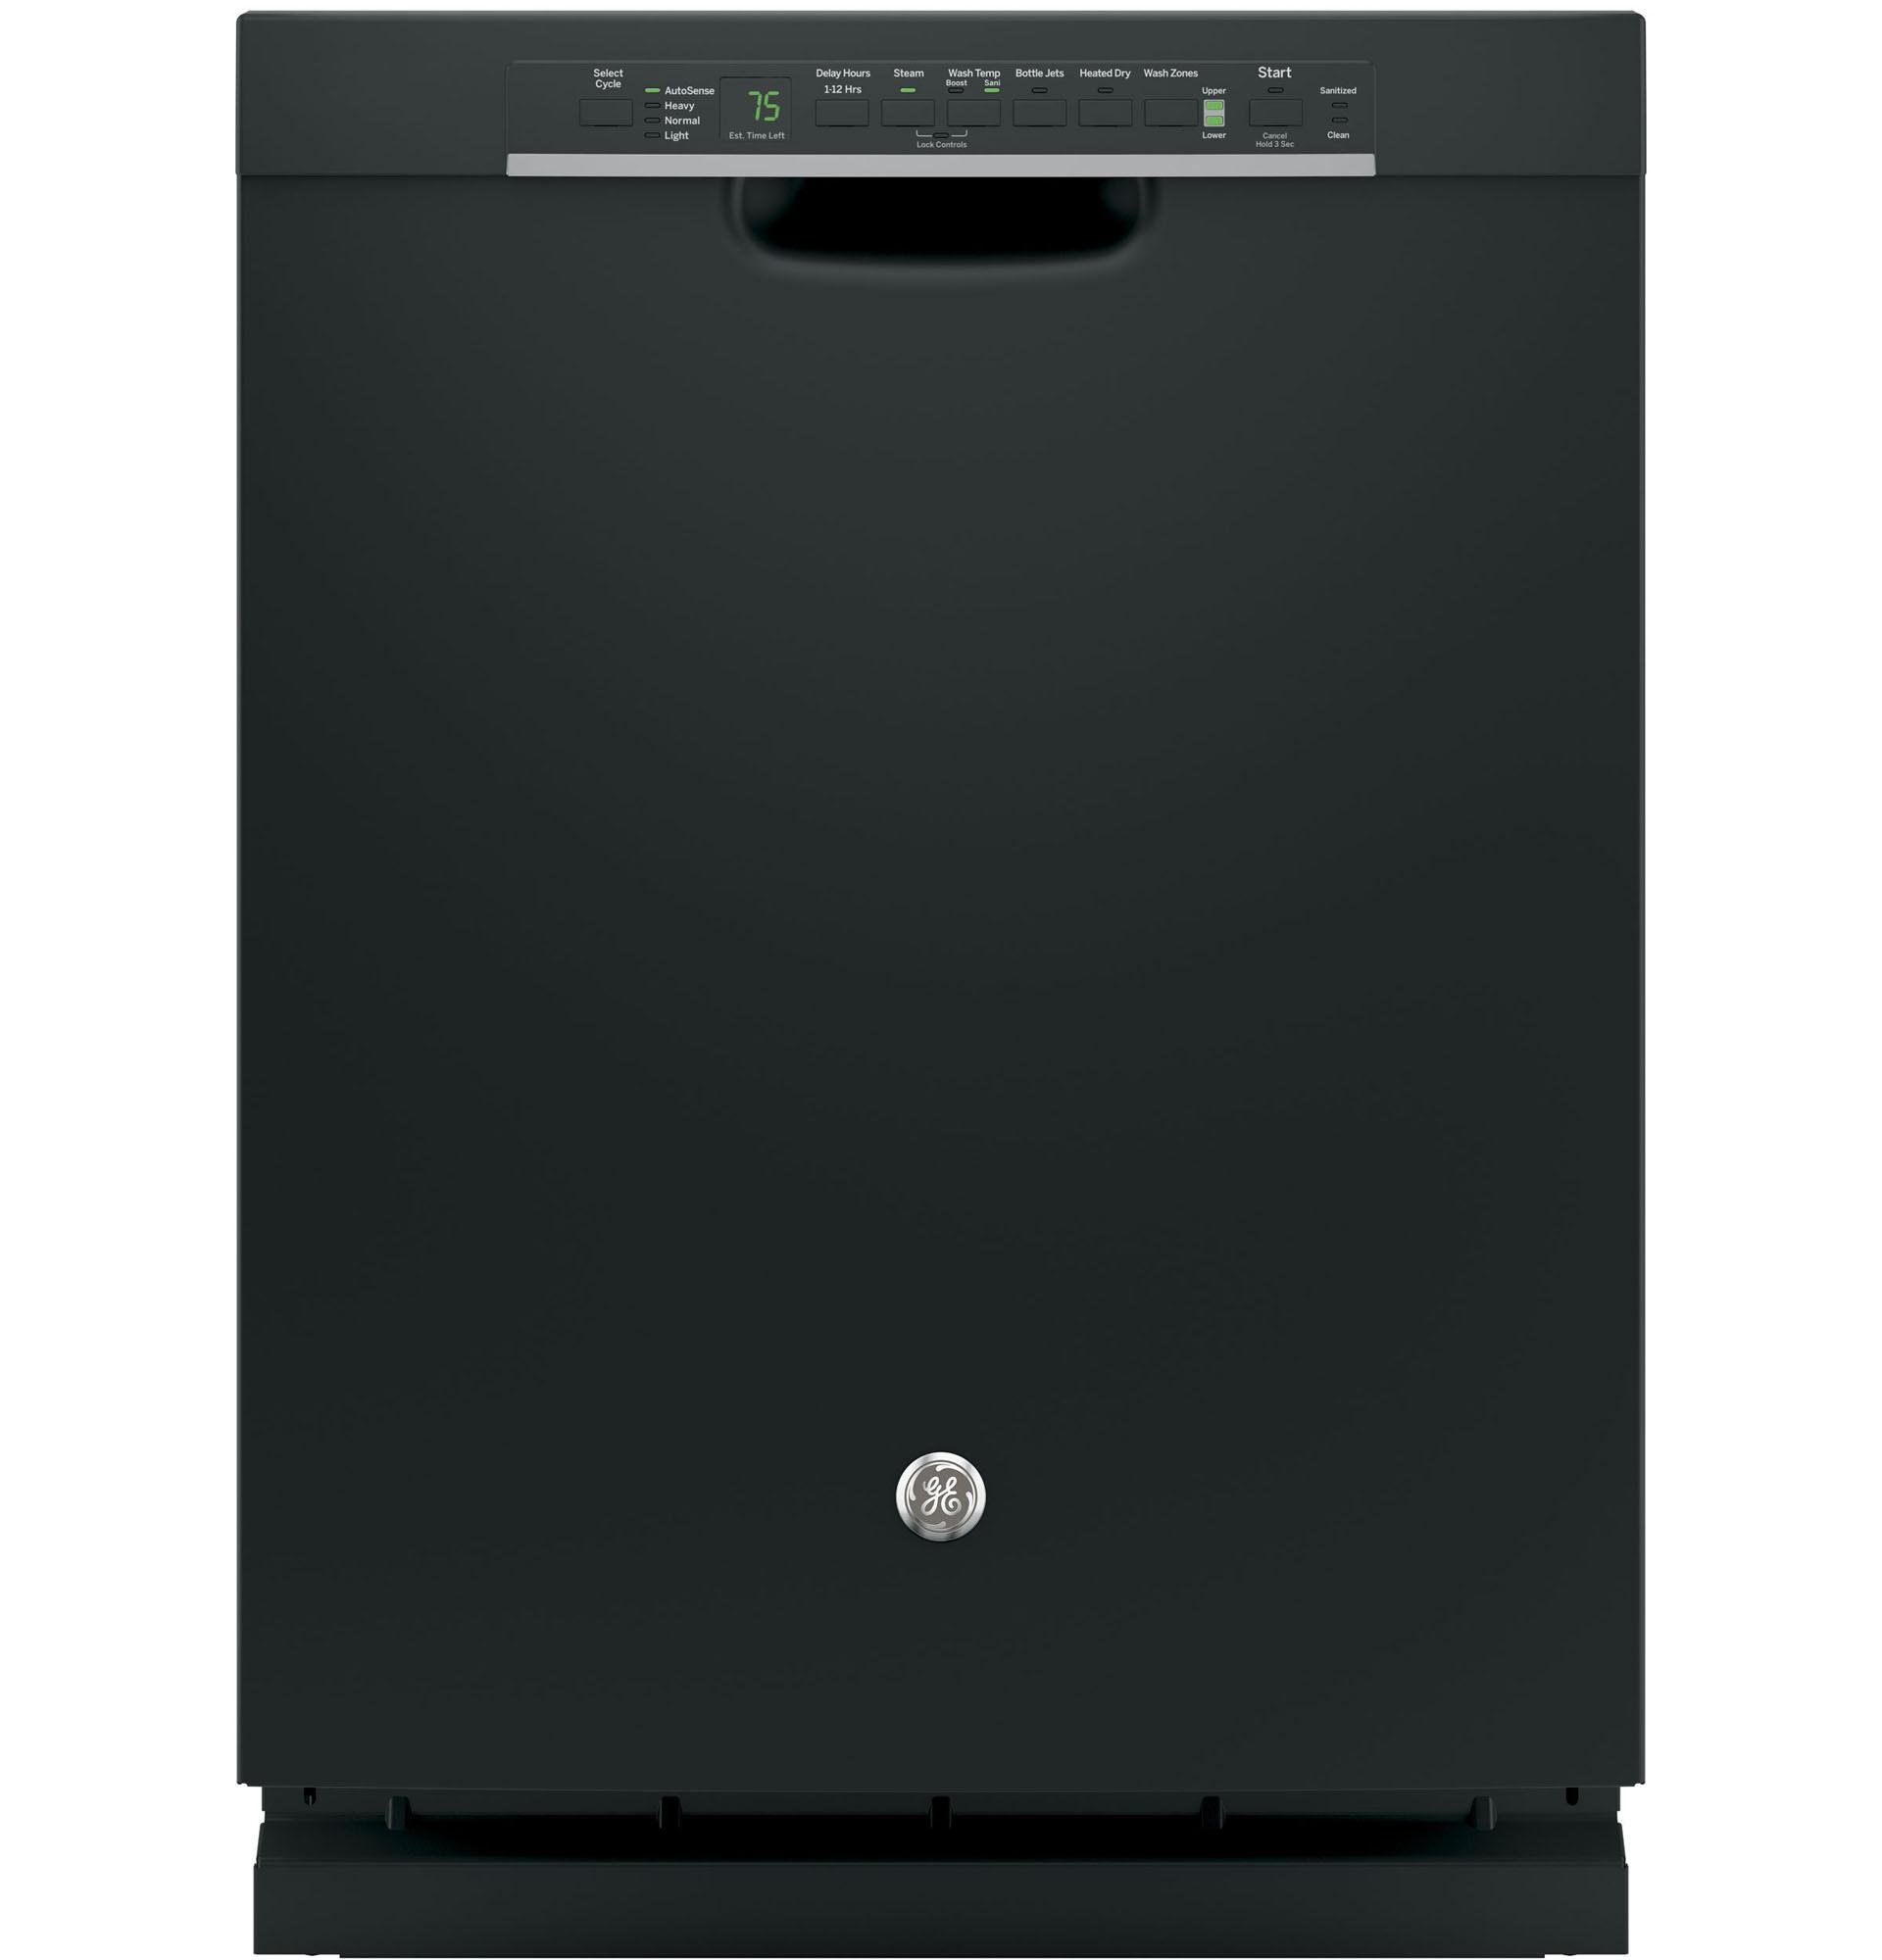 Shop Ge 24 In Black Dishwasher With Piranha Hard Food: GE Appliances GDF650SGJBB 24 In Built-In Dishwasher W